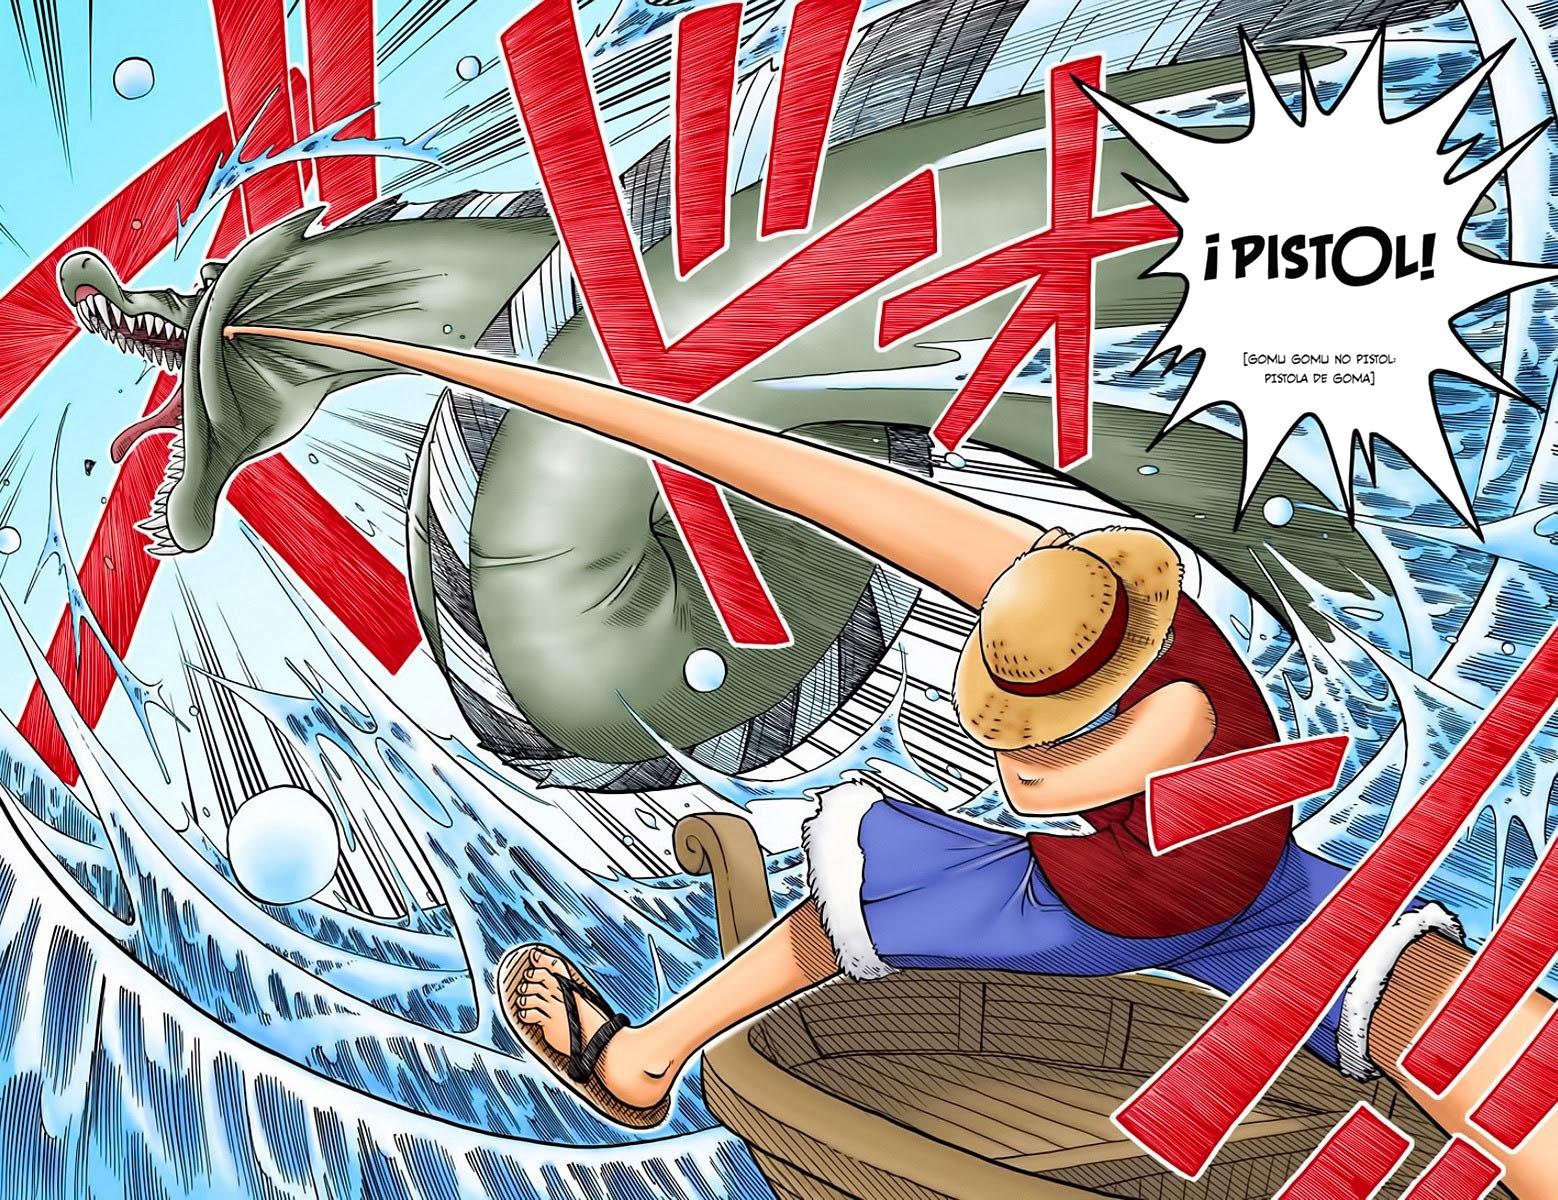 One Piece Manga 01 [Full Color] P5Gn45KI_o